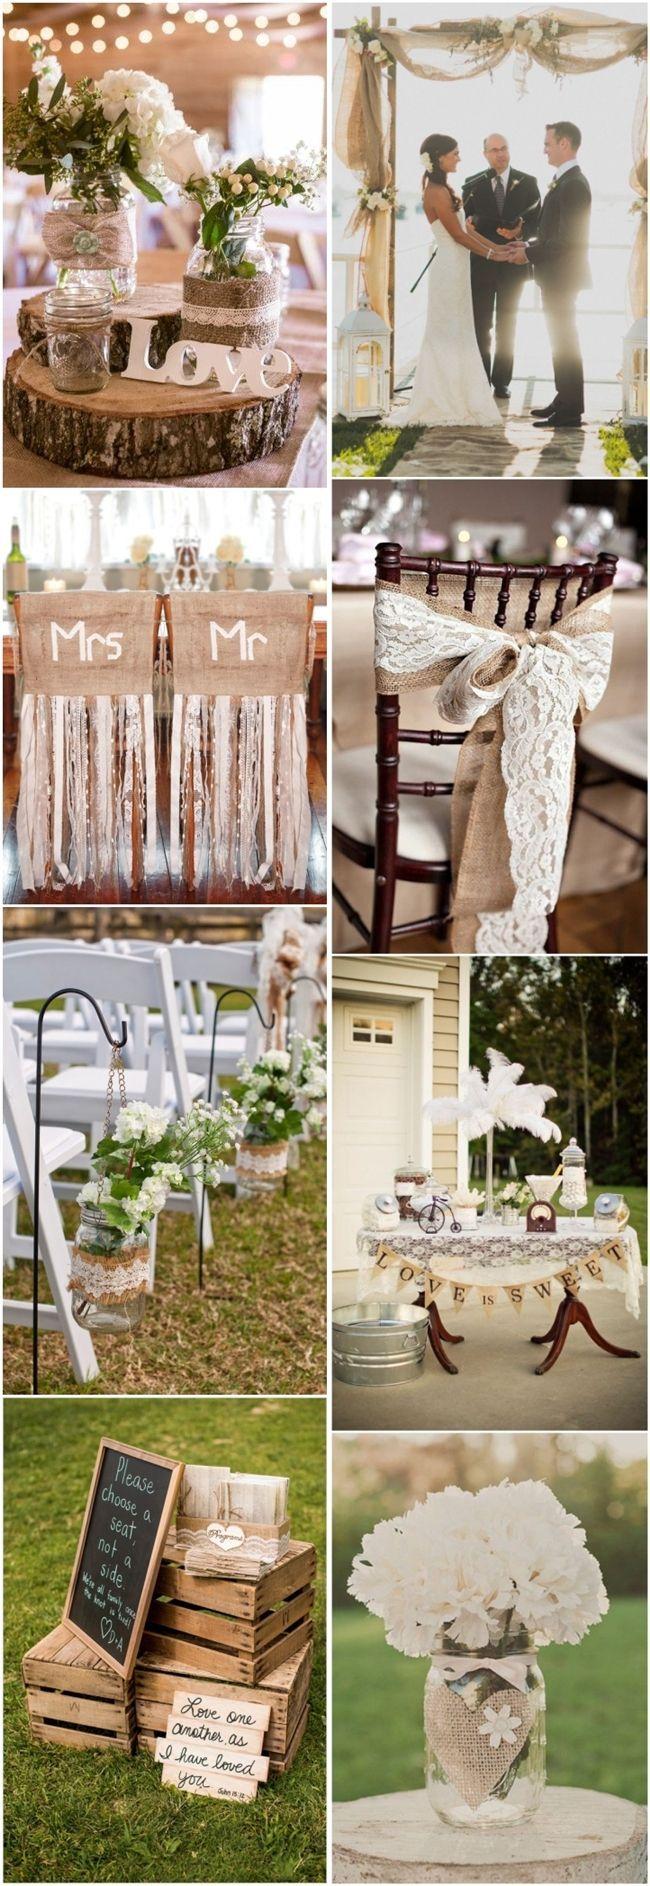 Best 25+ Lace wedding decorations ideas on Pinterest ...